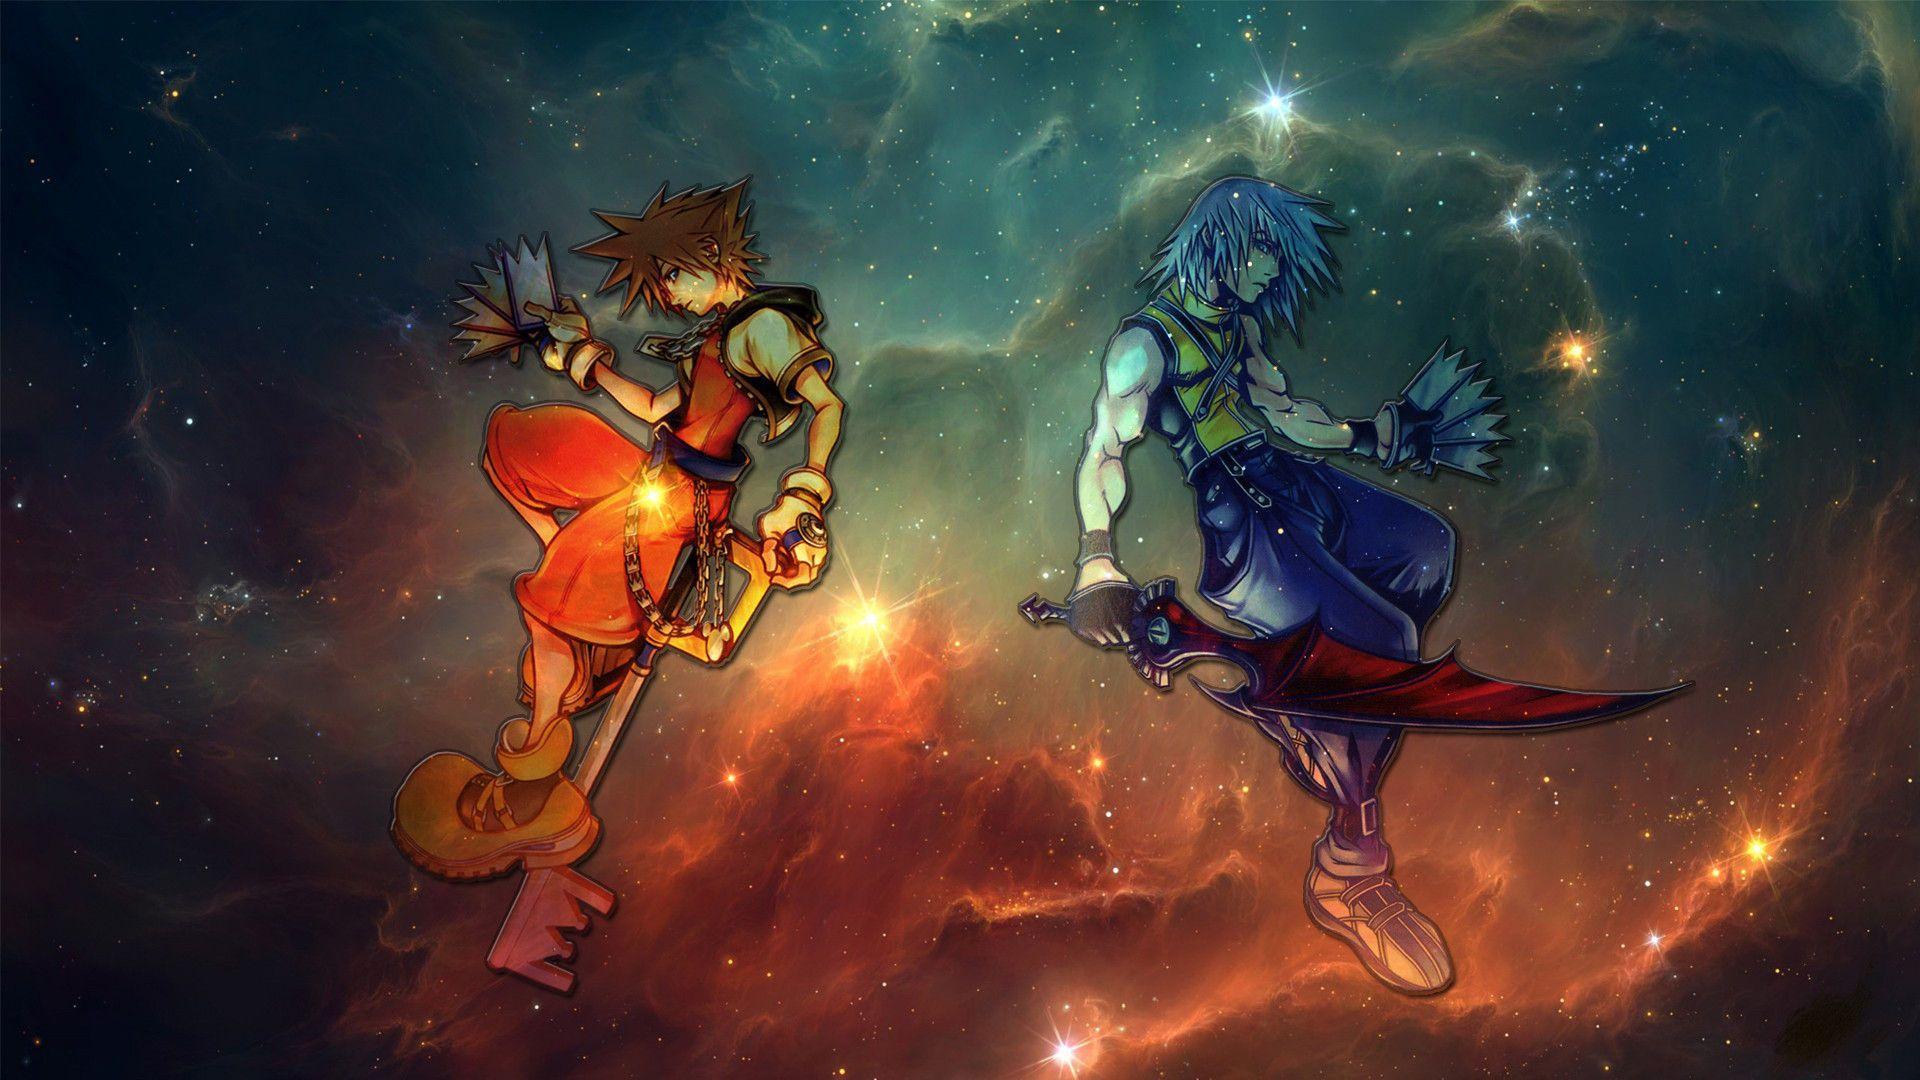 1080p Kingdom Hearts Roxas Wallpaper Anime Wallpapers